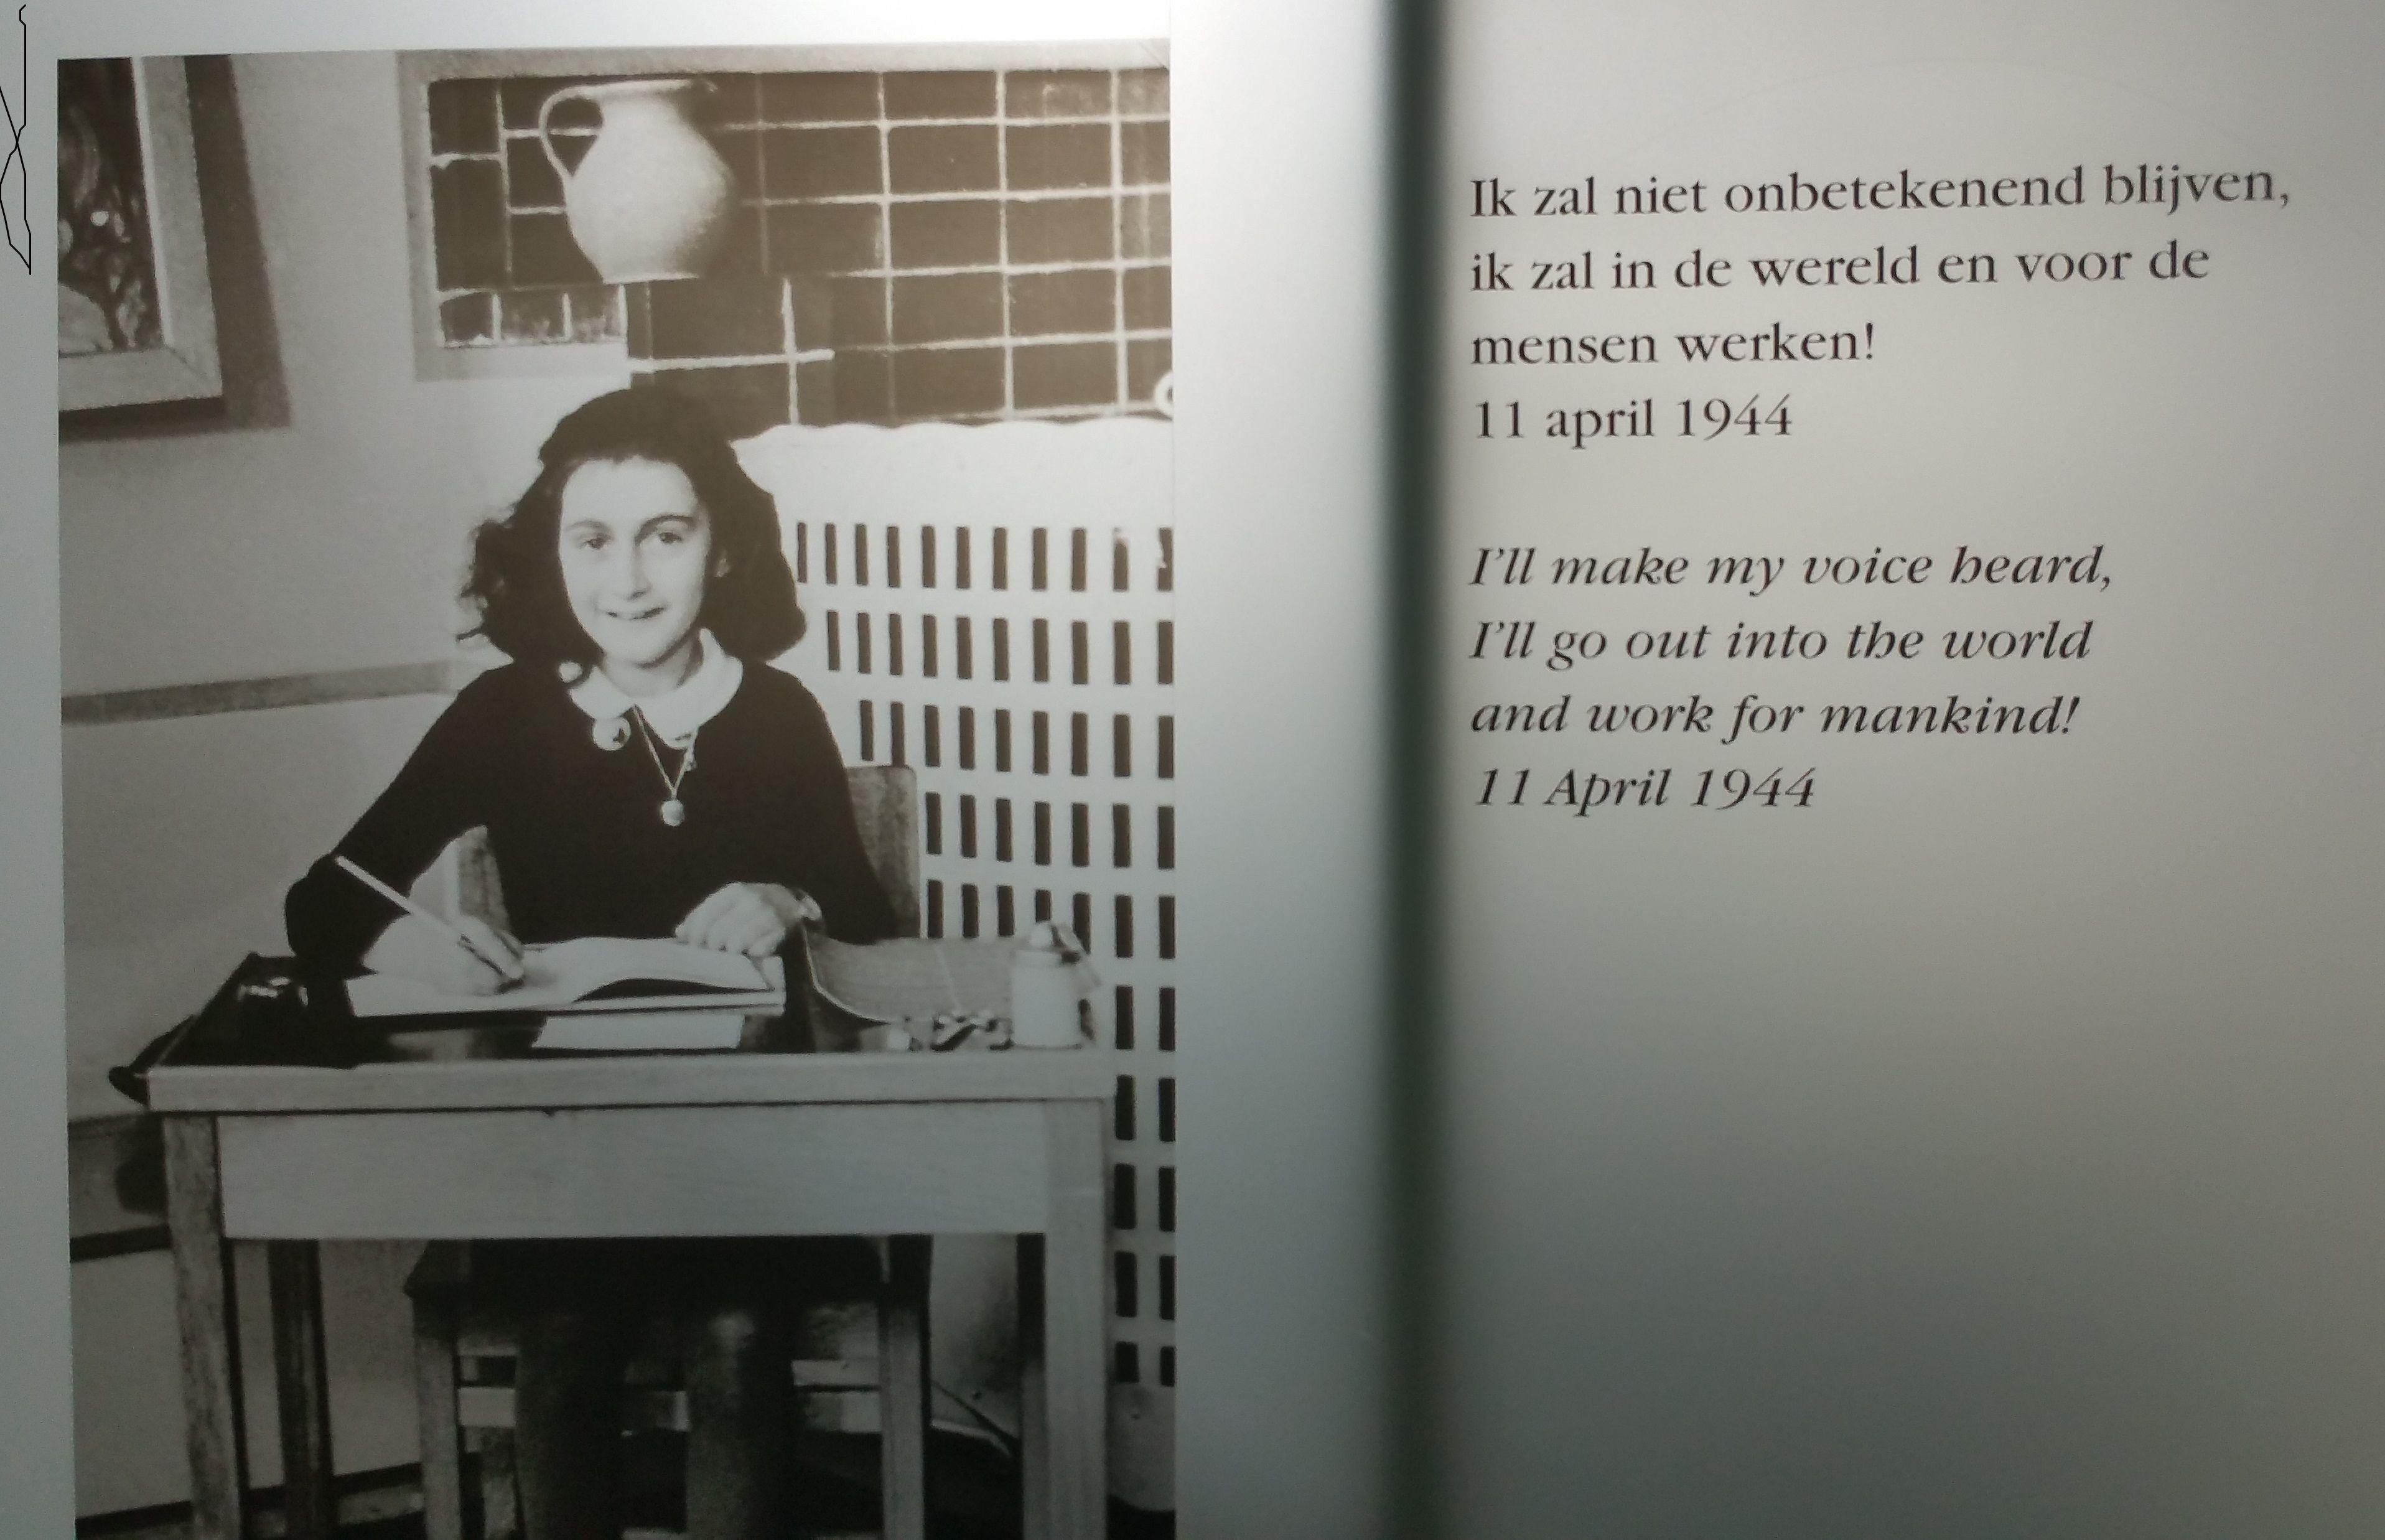 Citaten Van Anne Frank : Citaten dagboek anne frank google zoeken